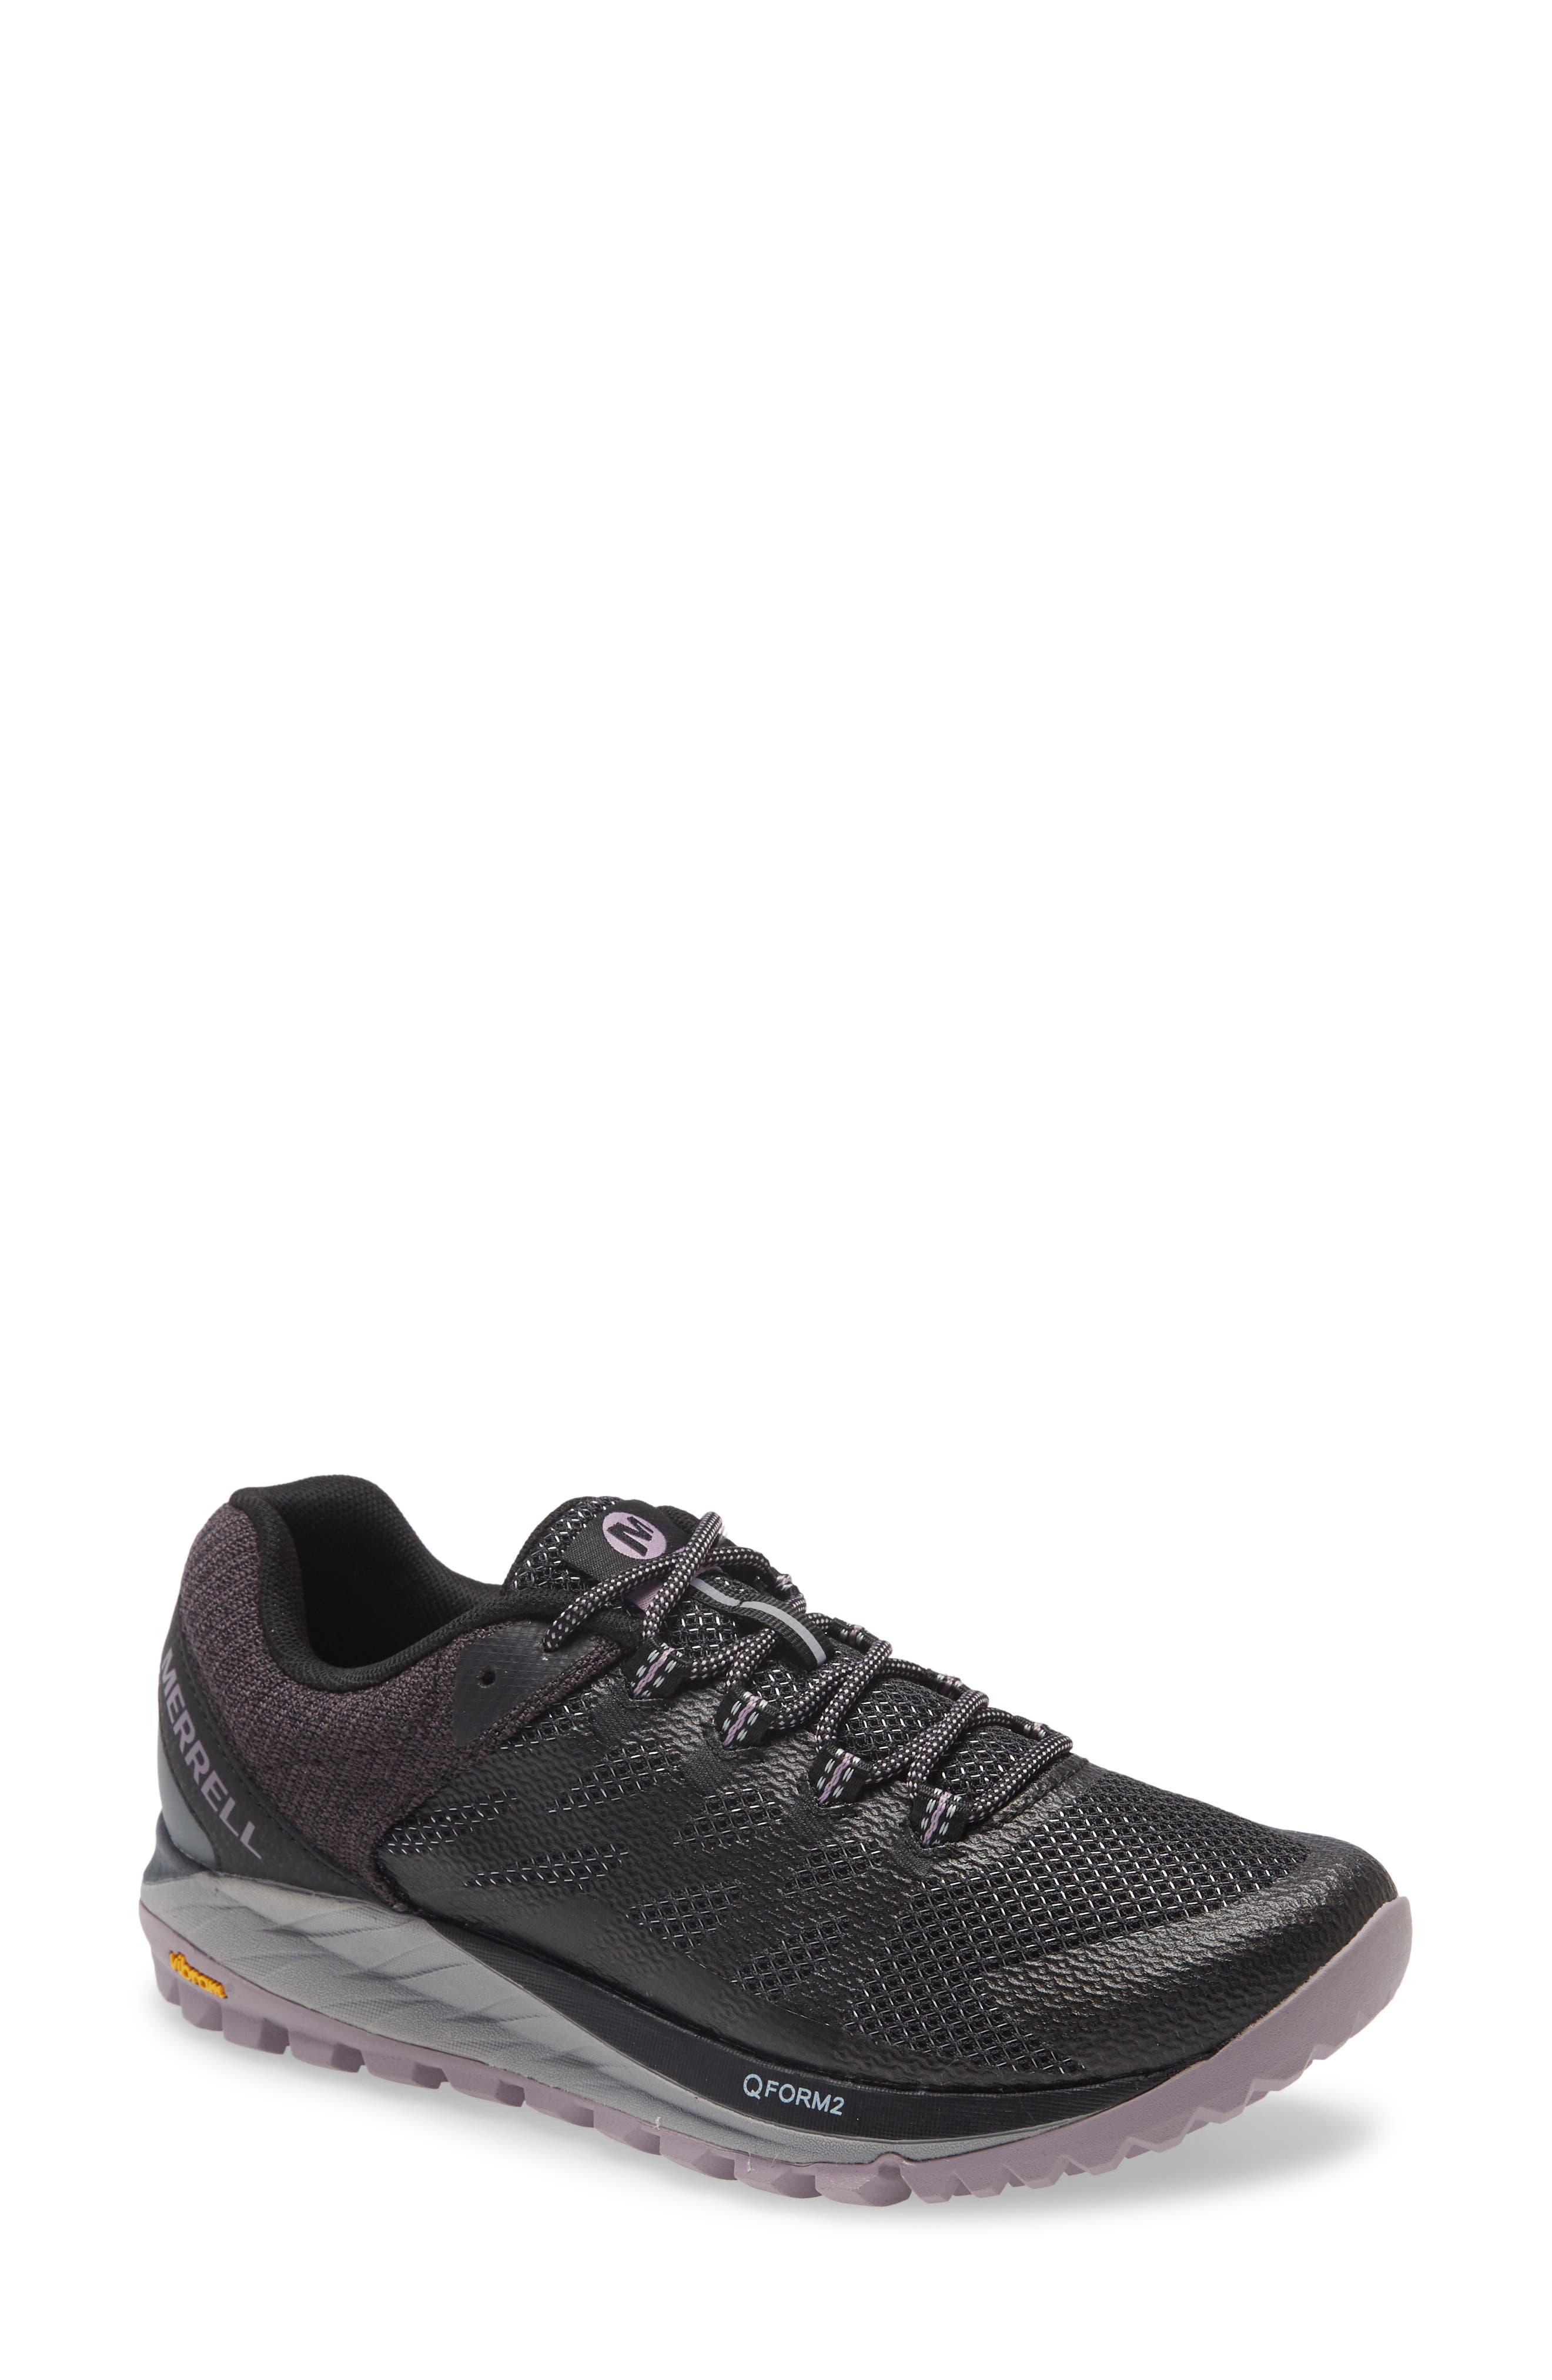 Antora 2 Trail Running Shoe